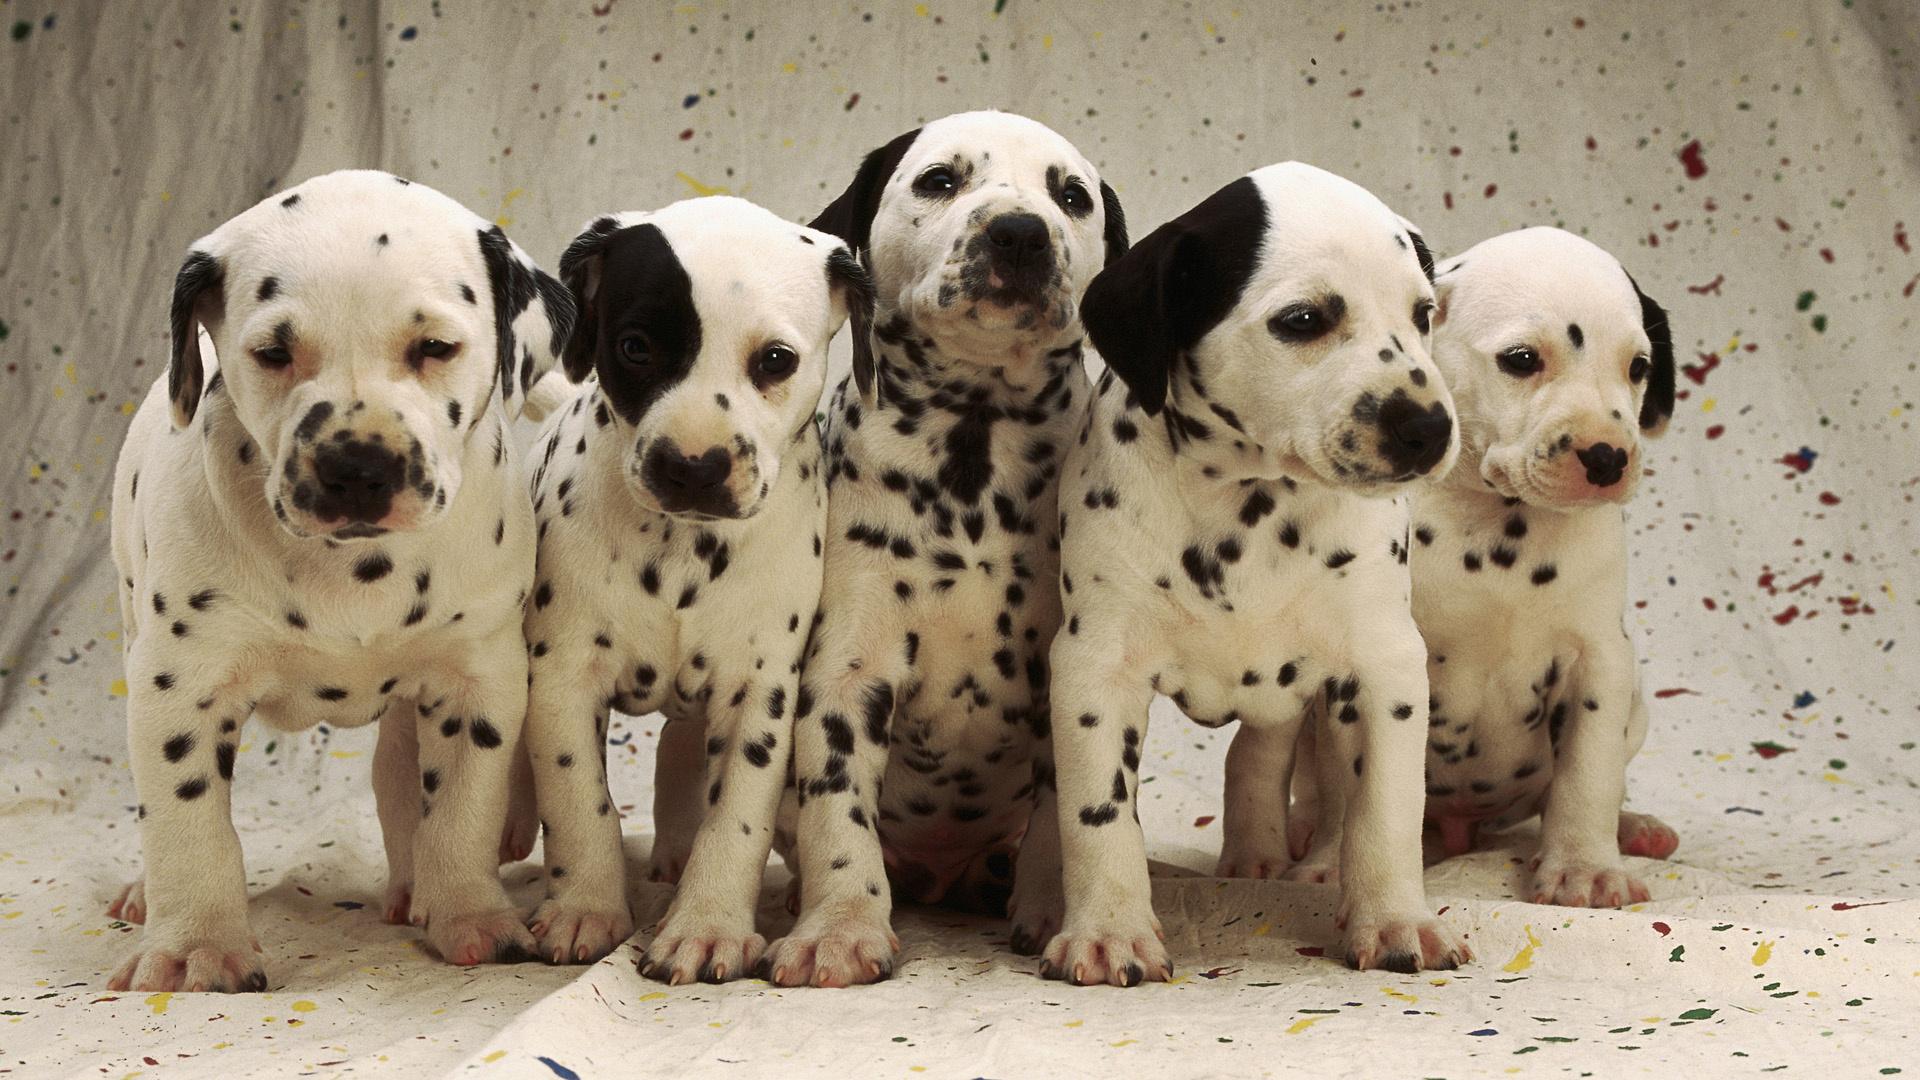 Cute Labrador Puppies Wallpapers Dalmatian Puppies Hd Desktop Wallpapers 4k Hd